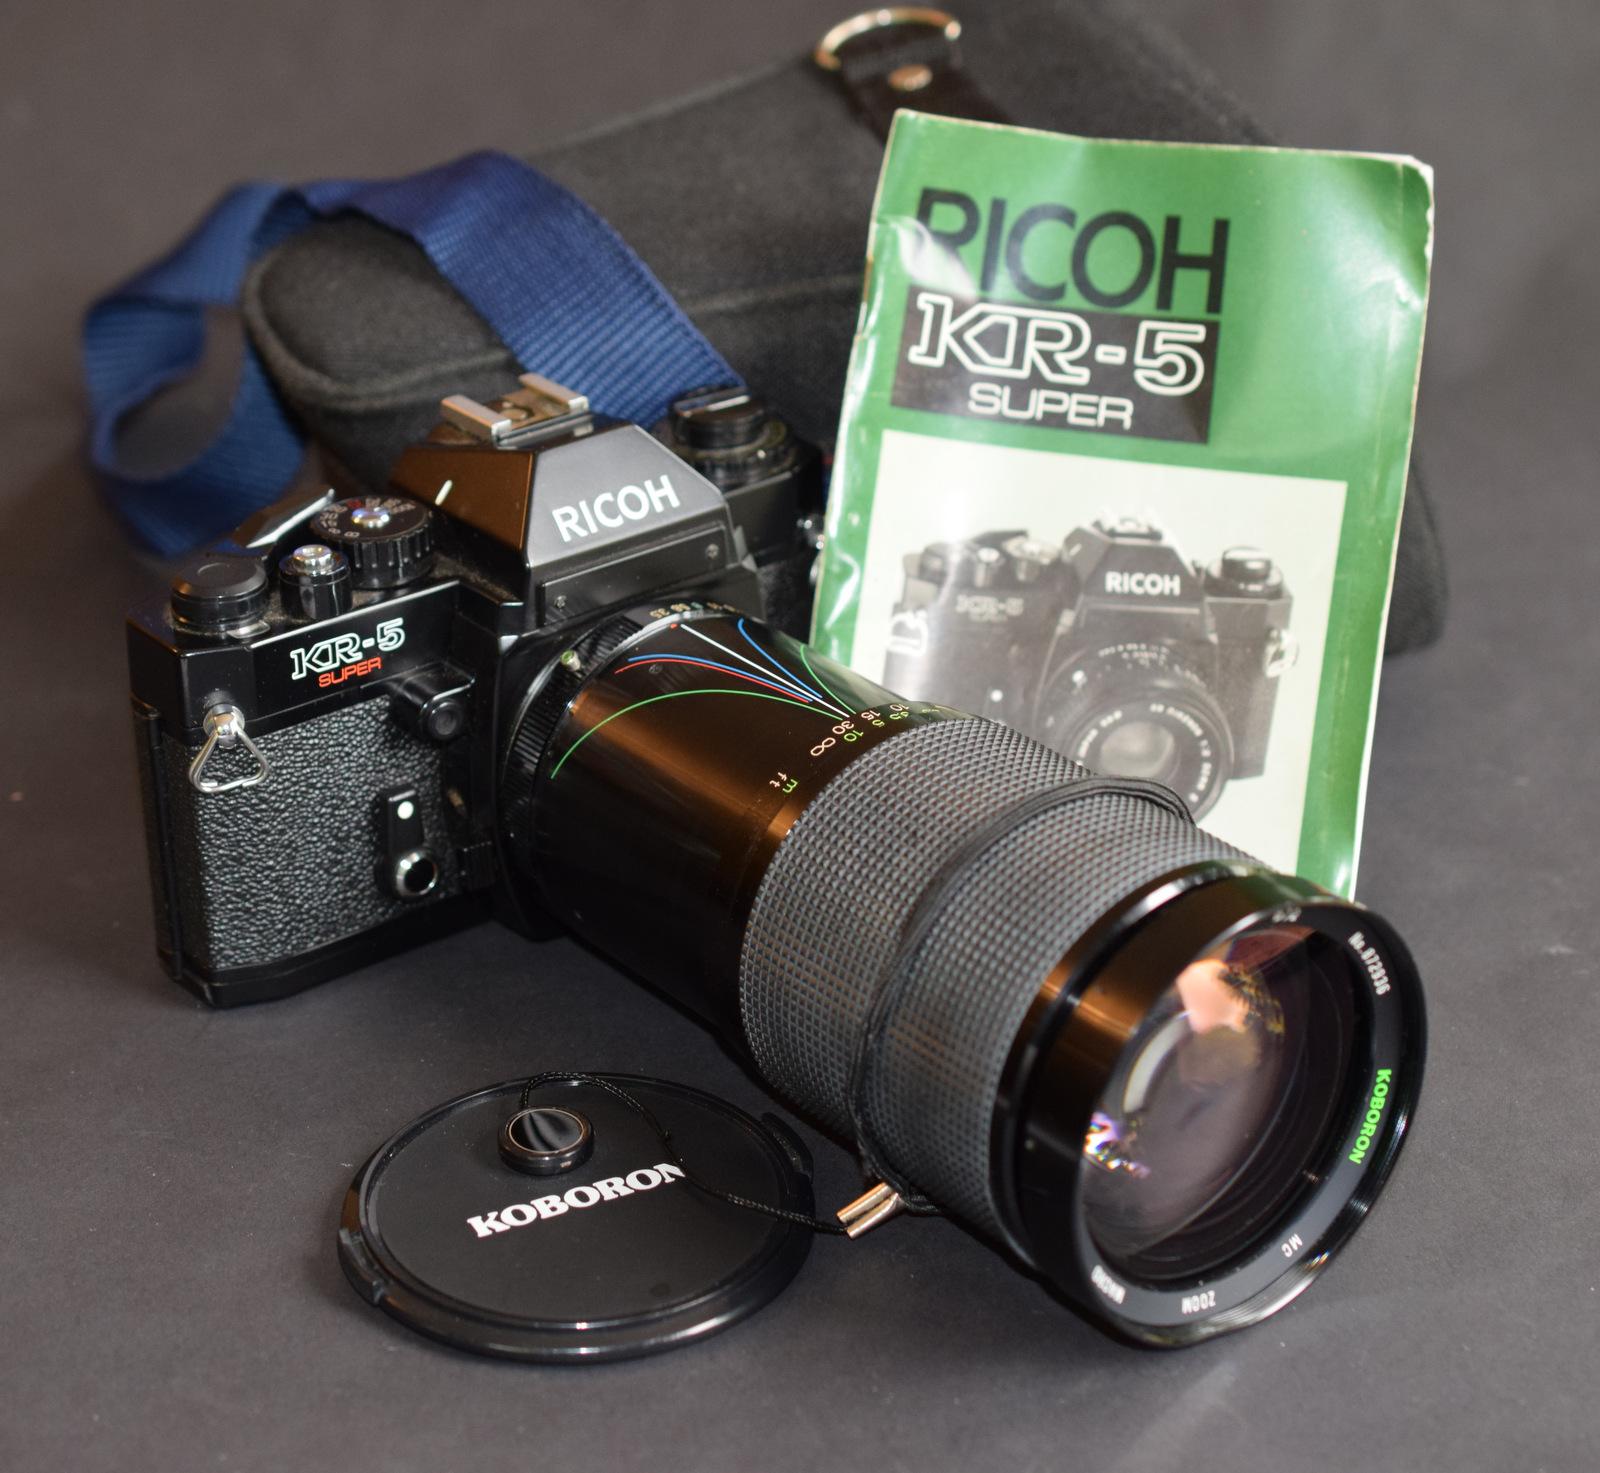 Lot 31 - Ricoh KR-5 Super With Koboron 1:3.5 - 5.3 Lens